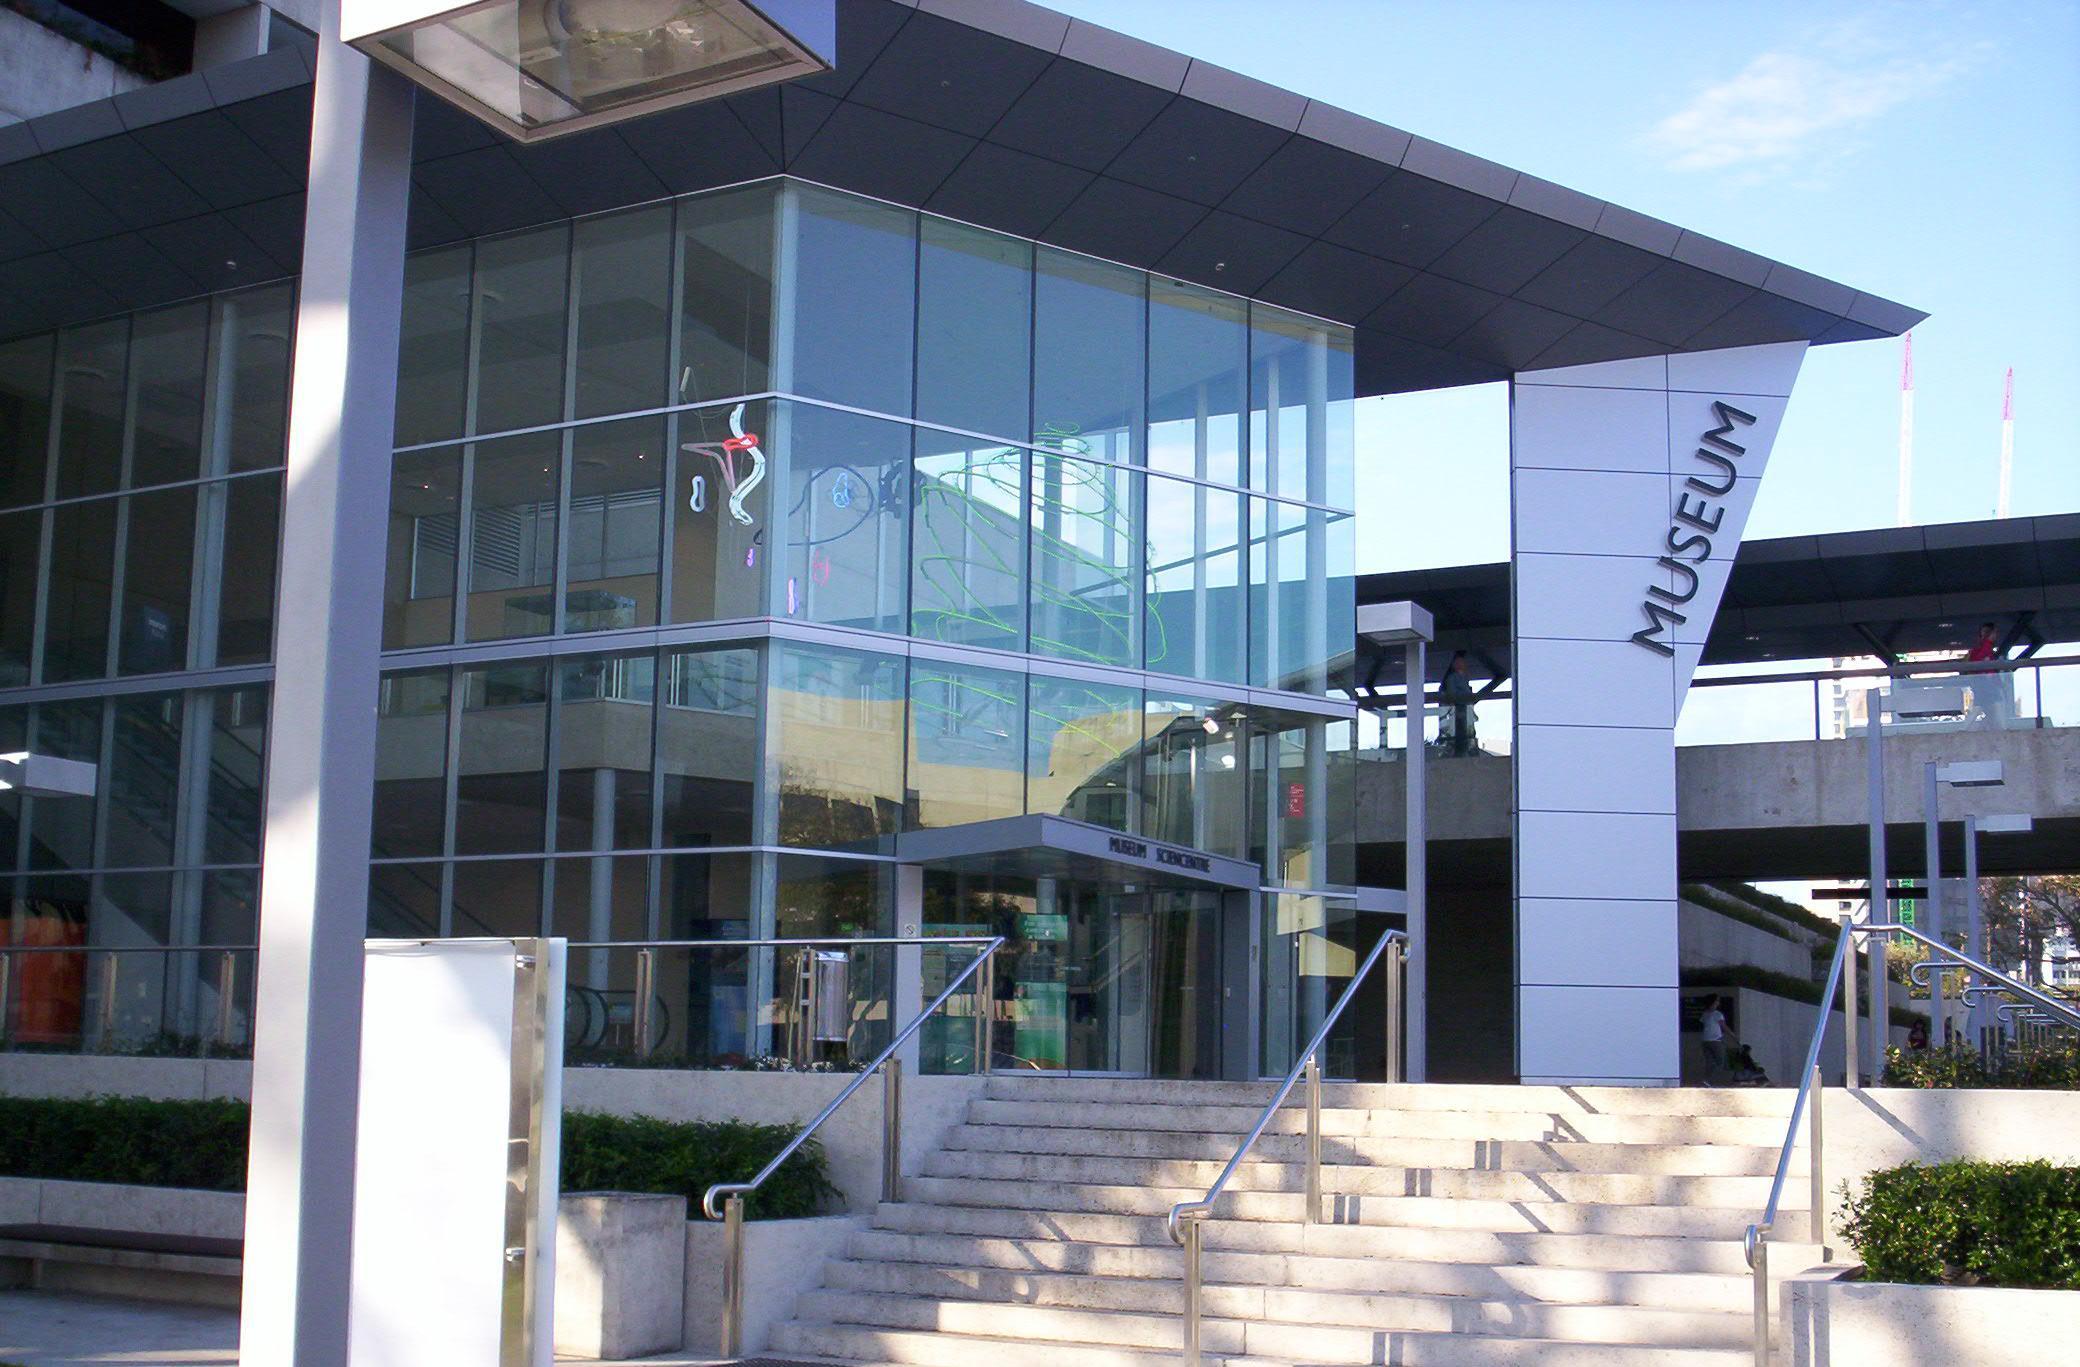 Queensland Museum-Sciencentre.JPG